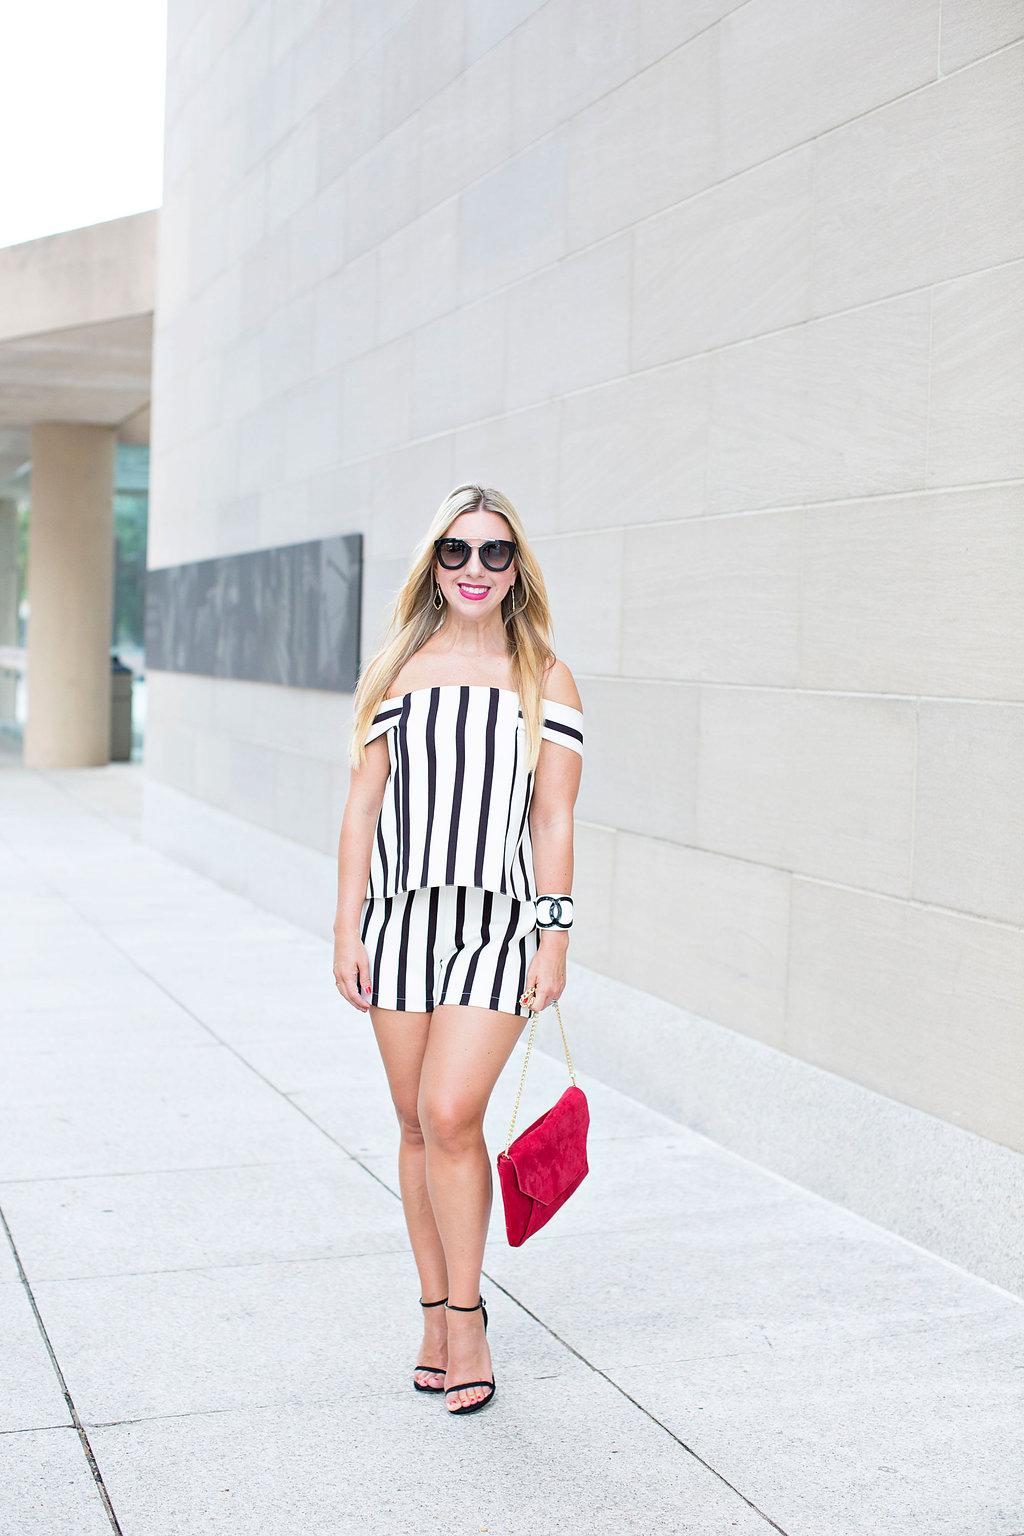 Fashion & Lifestyle Blog - The Darling Petite Diva